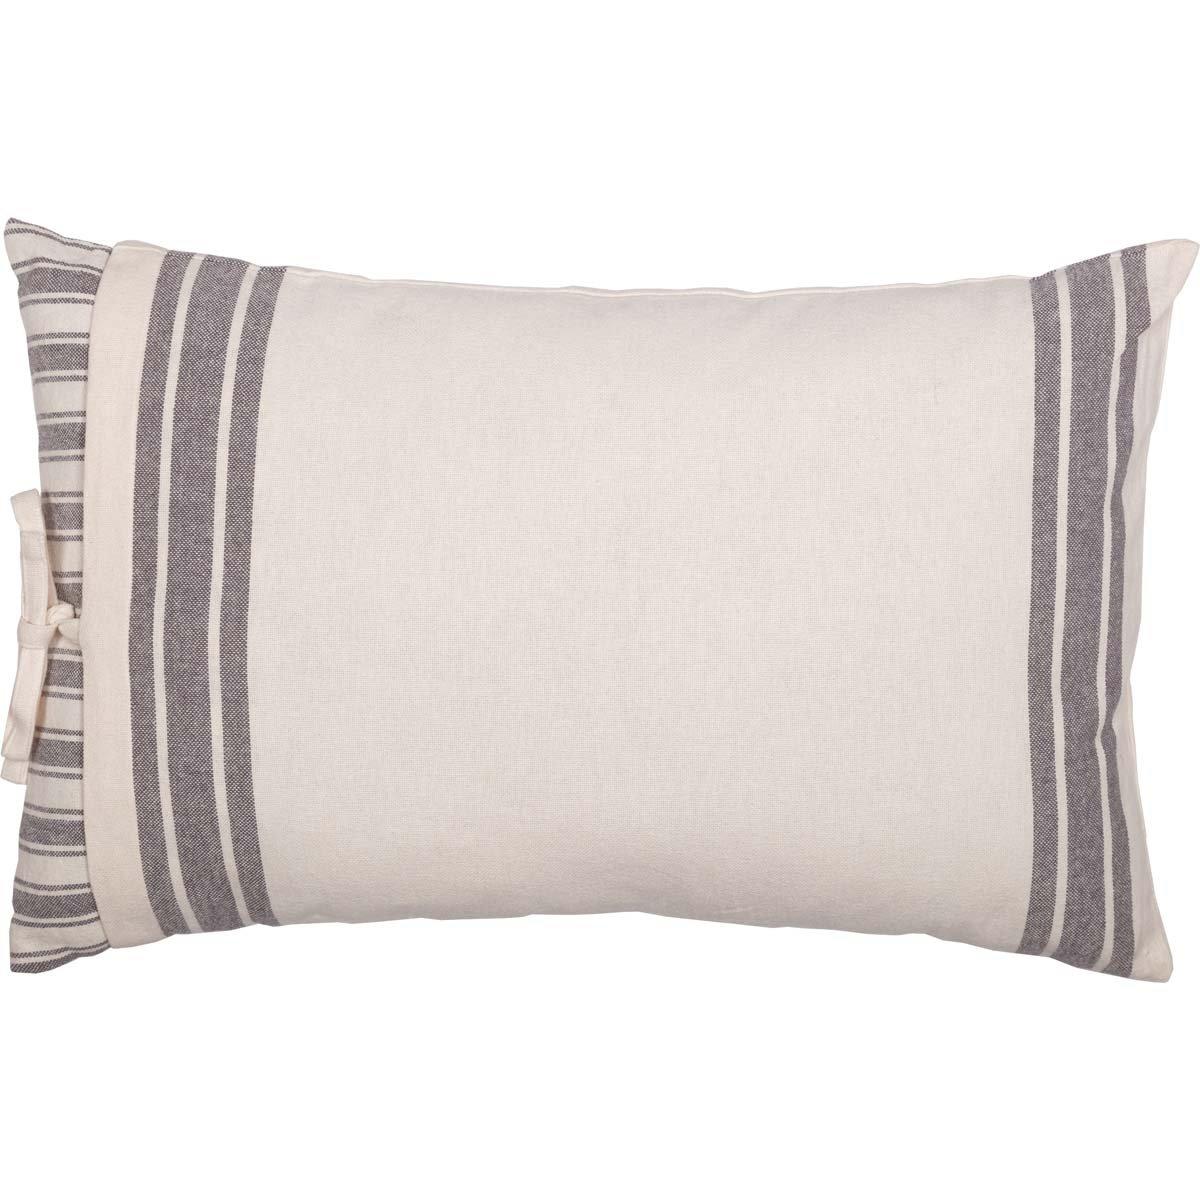 Piper Classics Market Place Duvet Cover 100/% Cotton 92 x 108 Neutral Grey /& Cream King Size Plaid Comforter Cover Modern Farmhouse Bedding 92 x 108